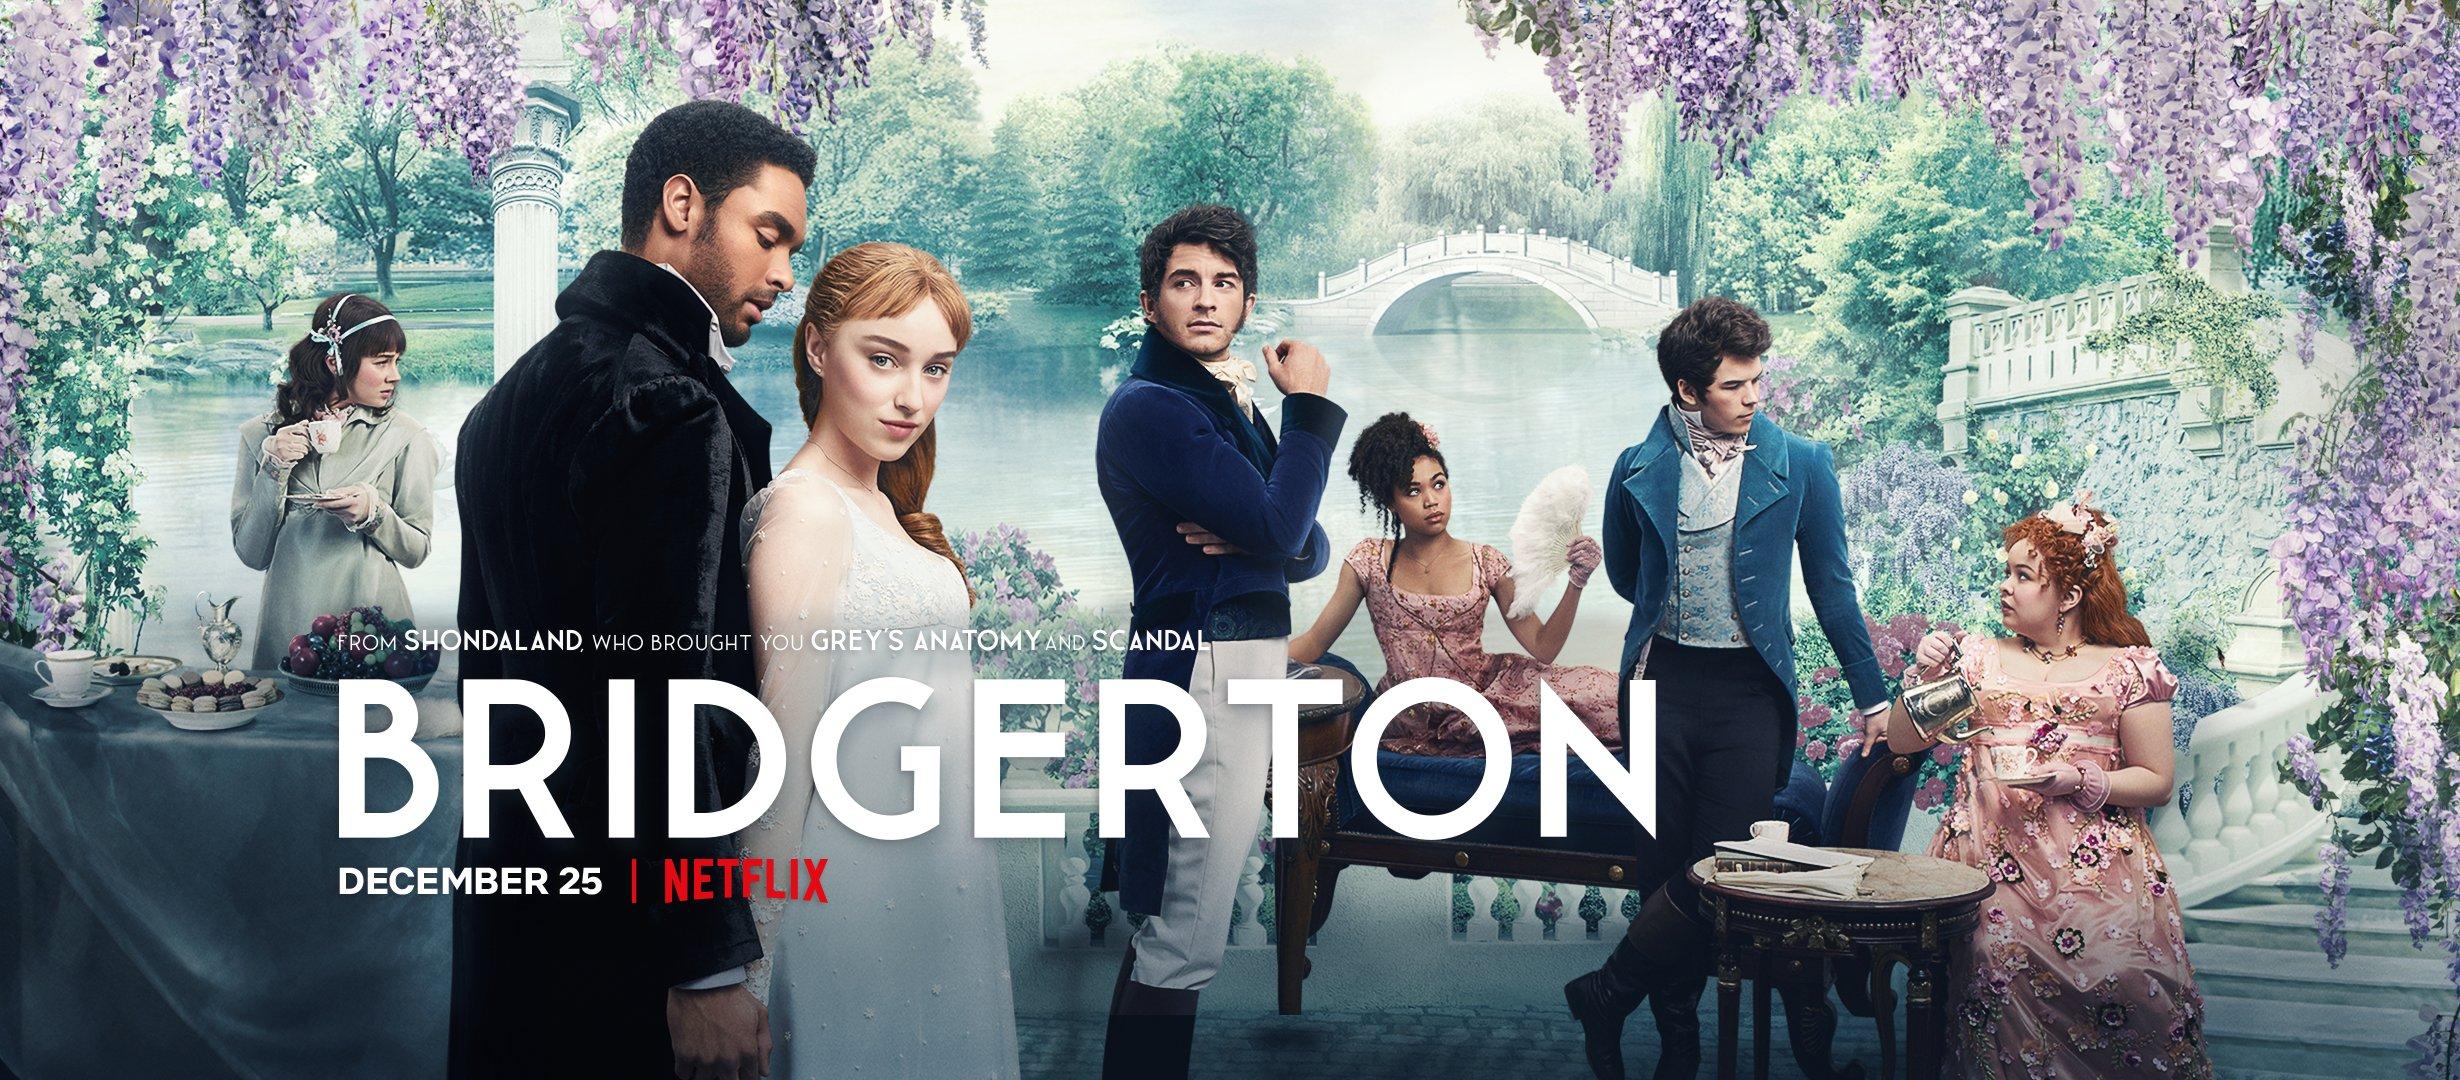 Netflix Series – Bridgerton